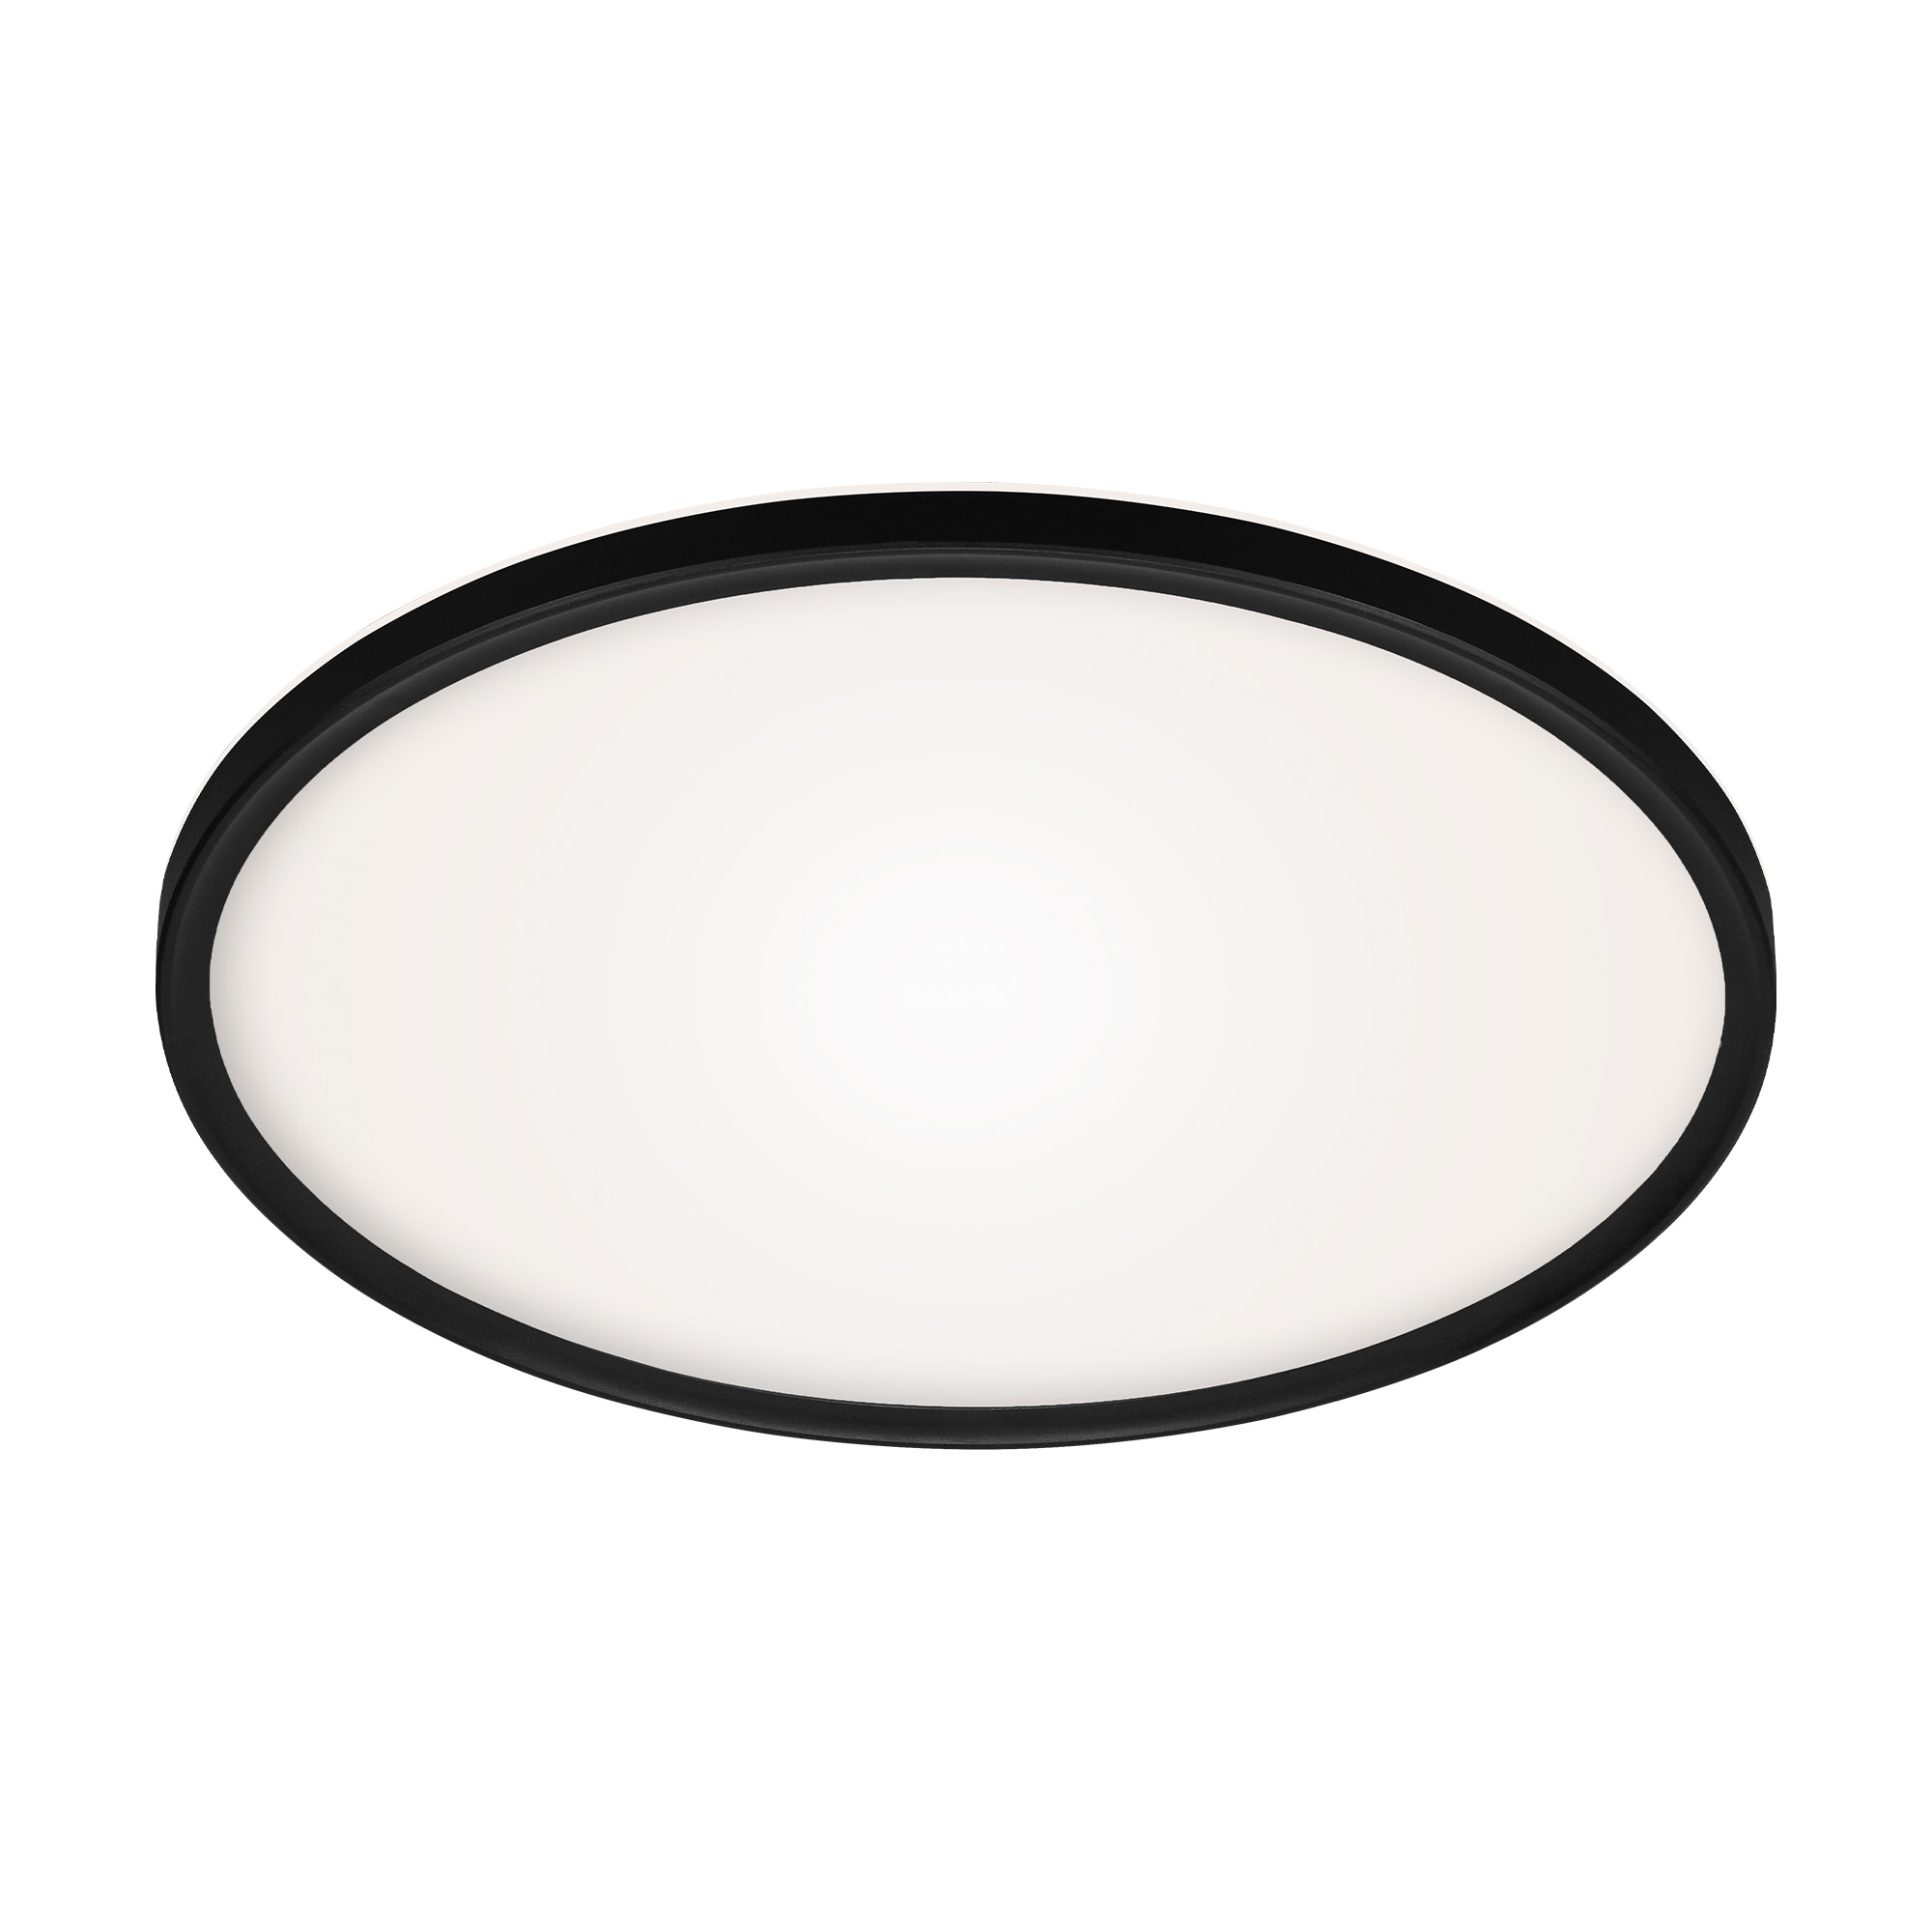 SLIM CCT LED Panel, Ø 42 cm, 22 W, Schwarz